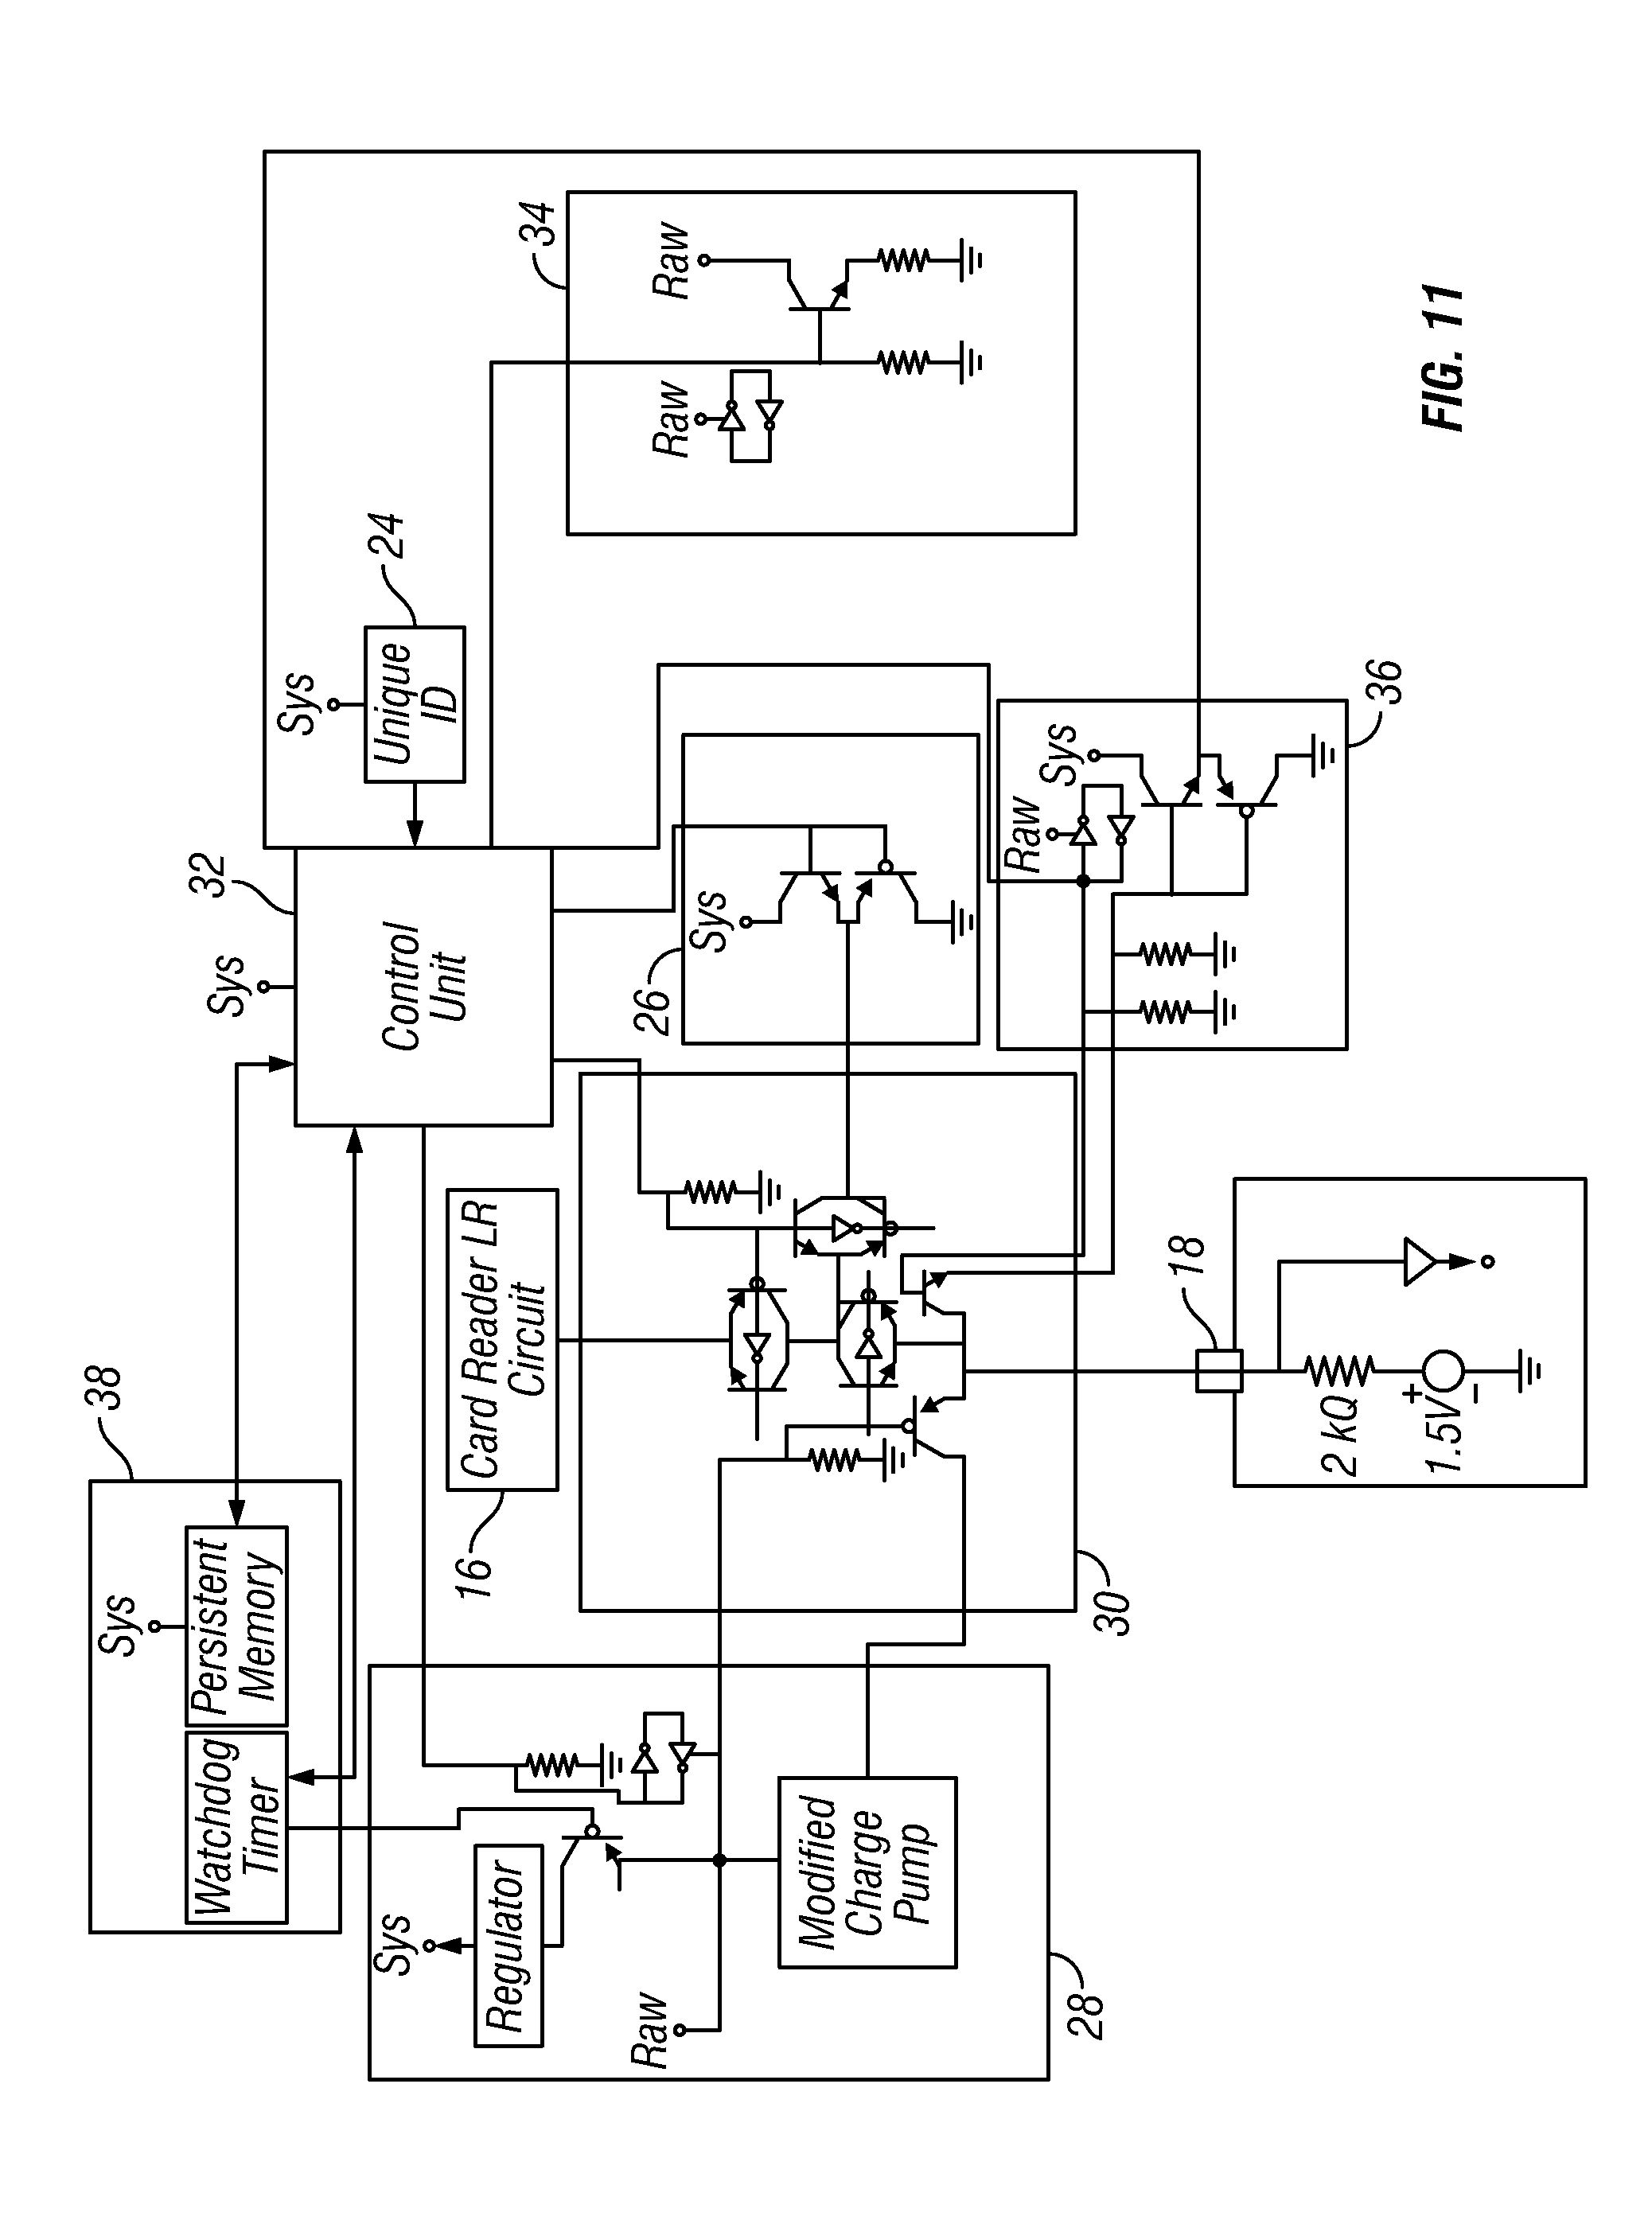 Cool Card Reader Wiring Schematic 4l 80 Wiring Harness